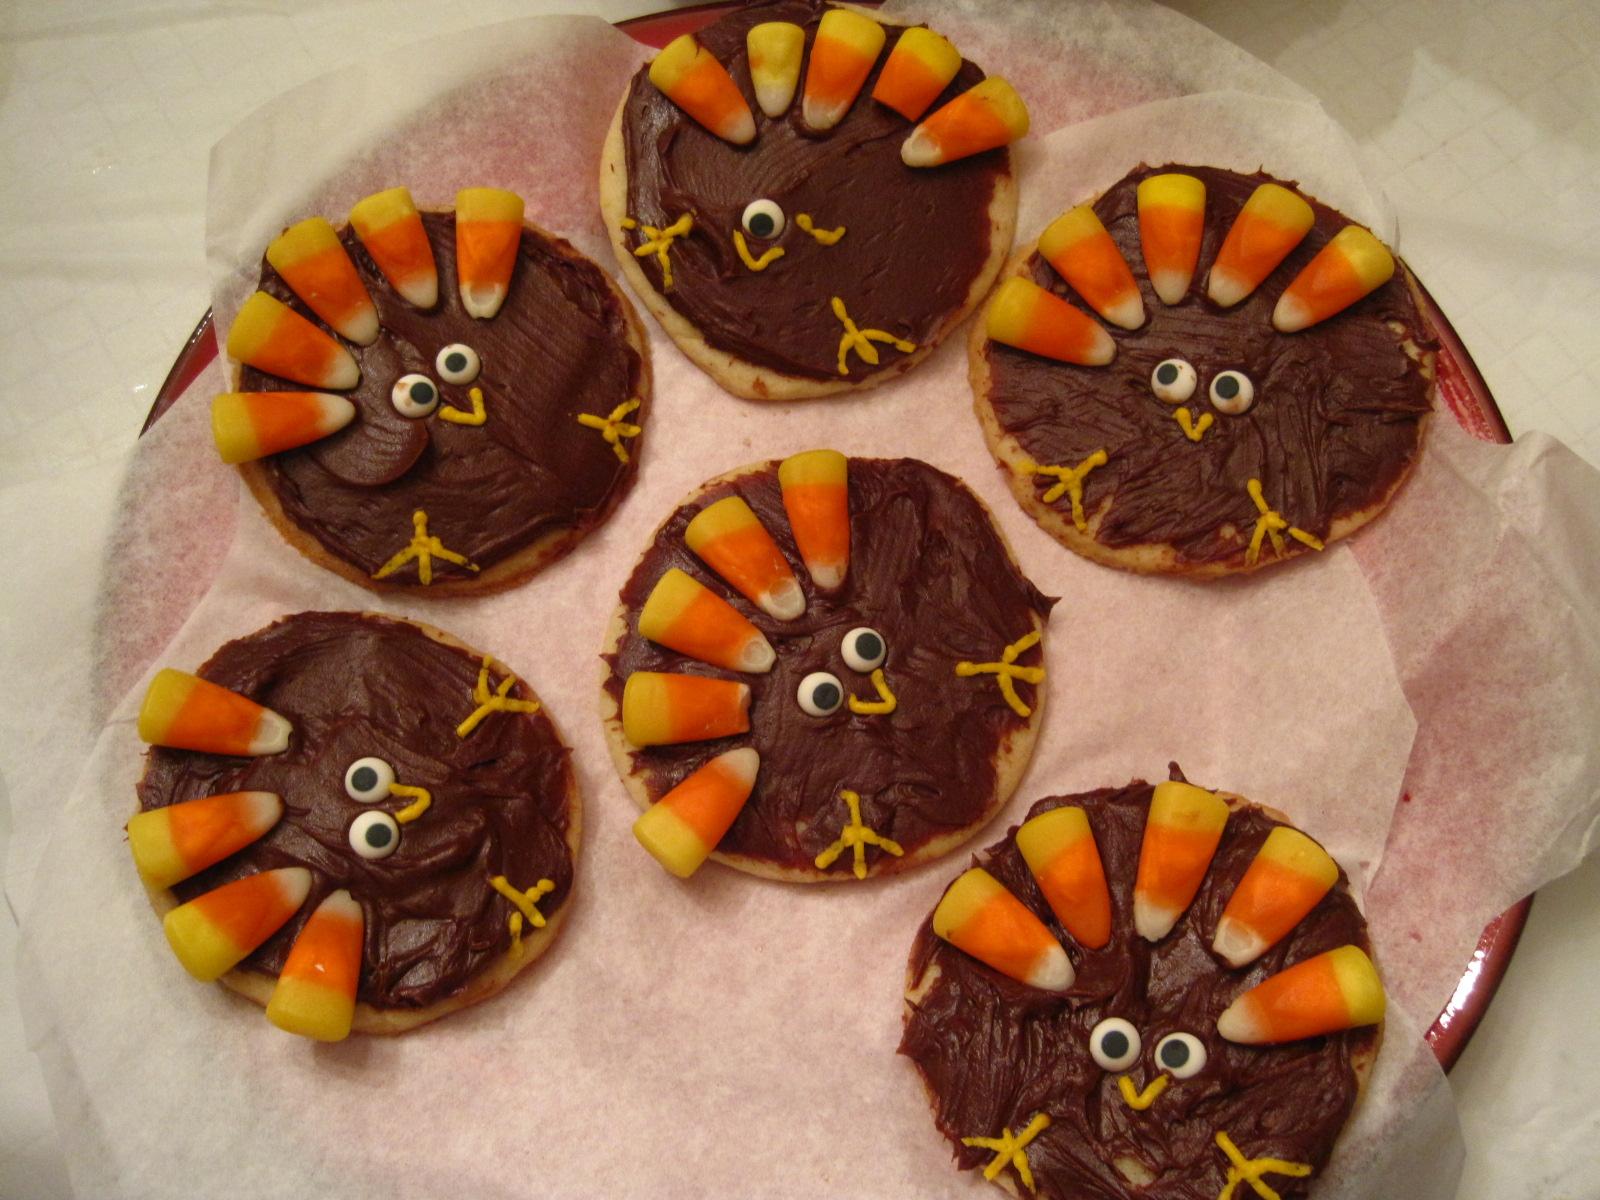 Pin thanksgiving cupcakes decorating ideas cake on pinterest for Decorations for thanksgiving cupcakes